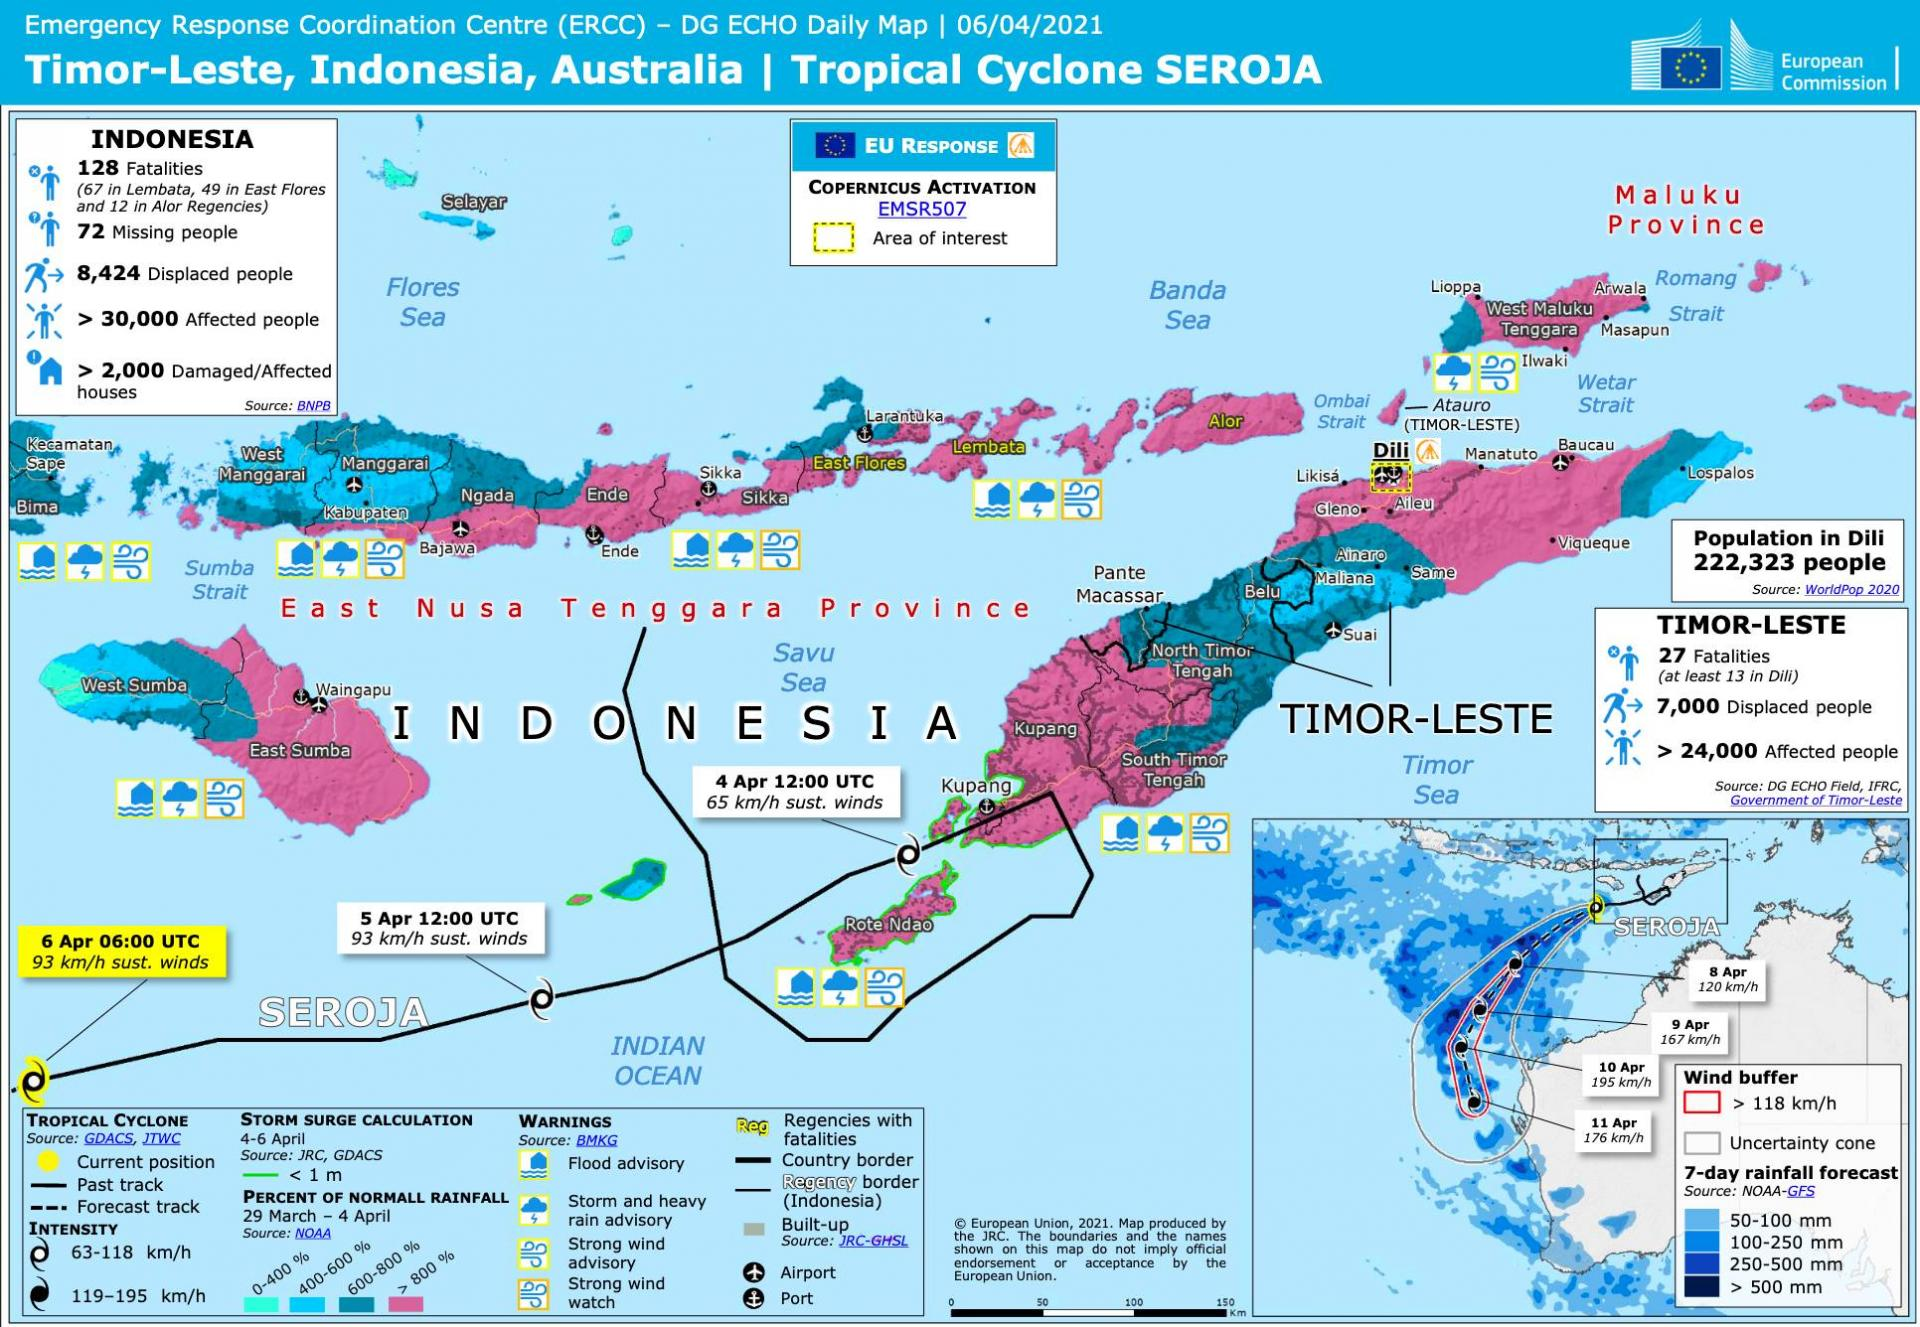 Seroja indonesie timor leste